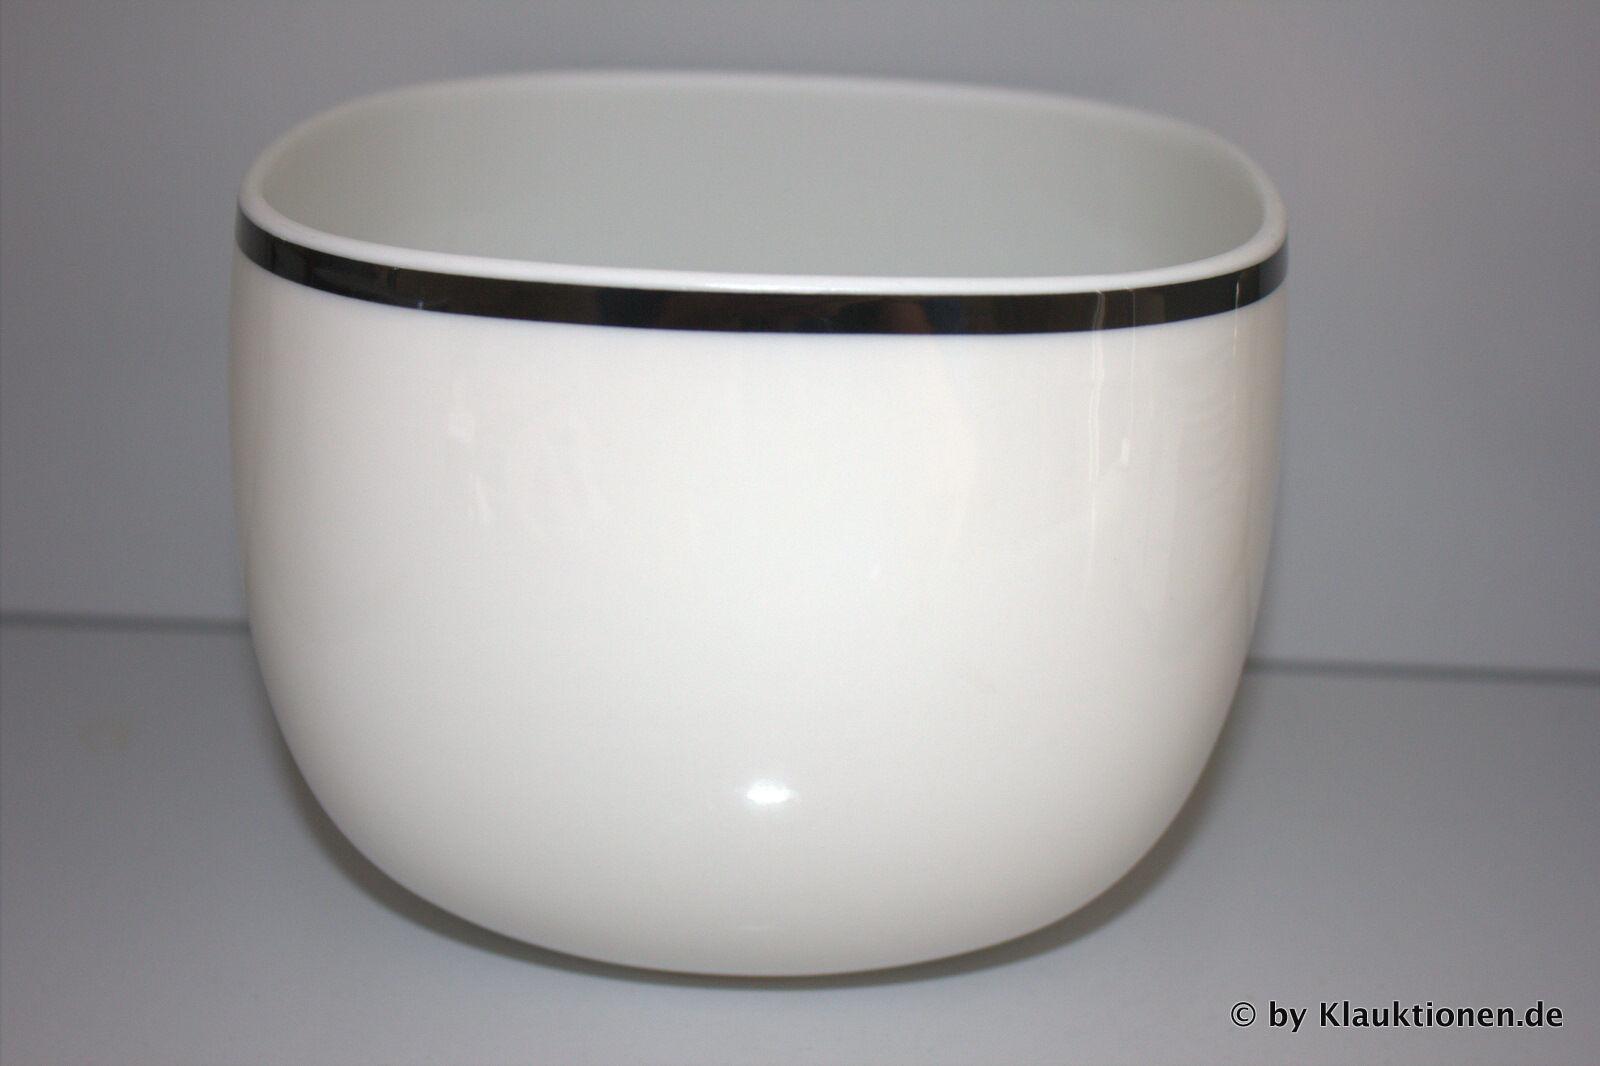 Rosenthal SUOMI ANTHRACITE Bol 16 cm 1,75 L Salad Timo Sarpaneva Salad Bowl